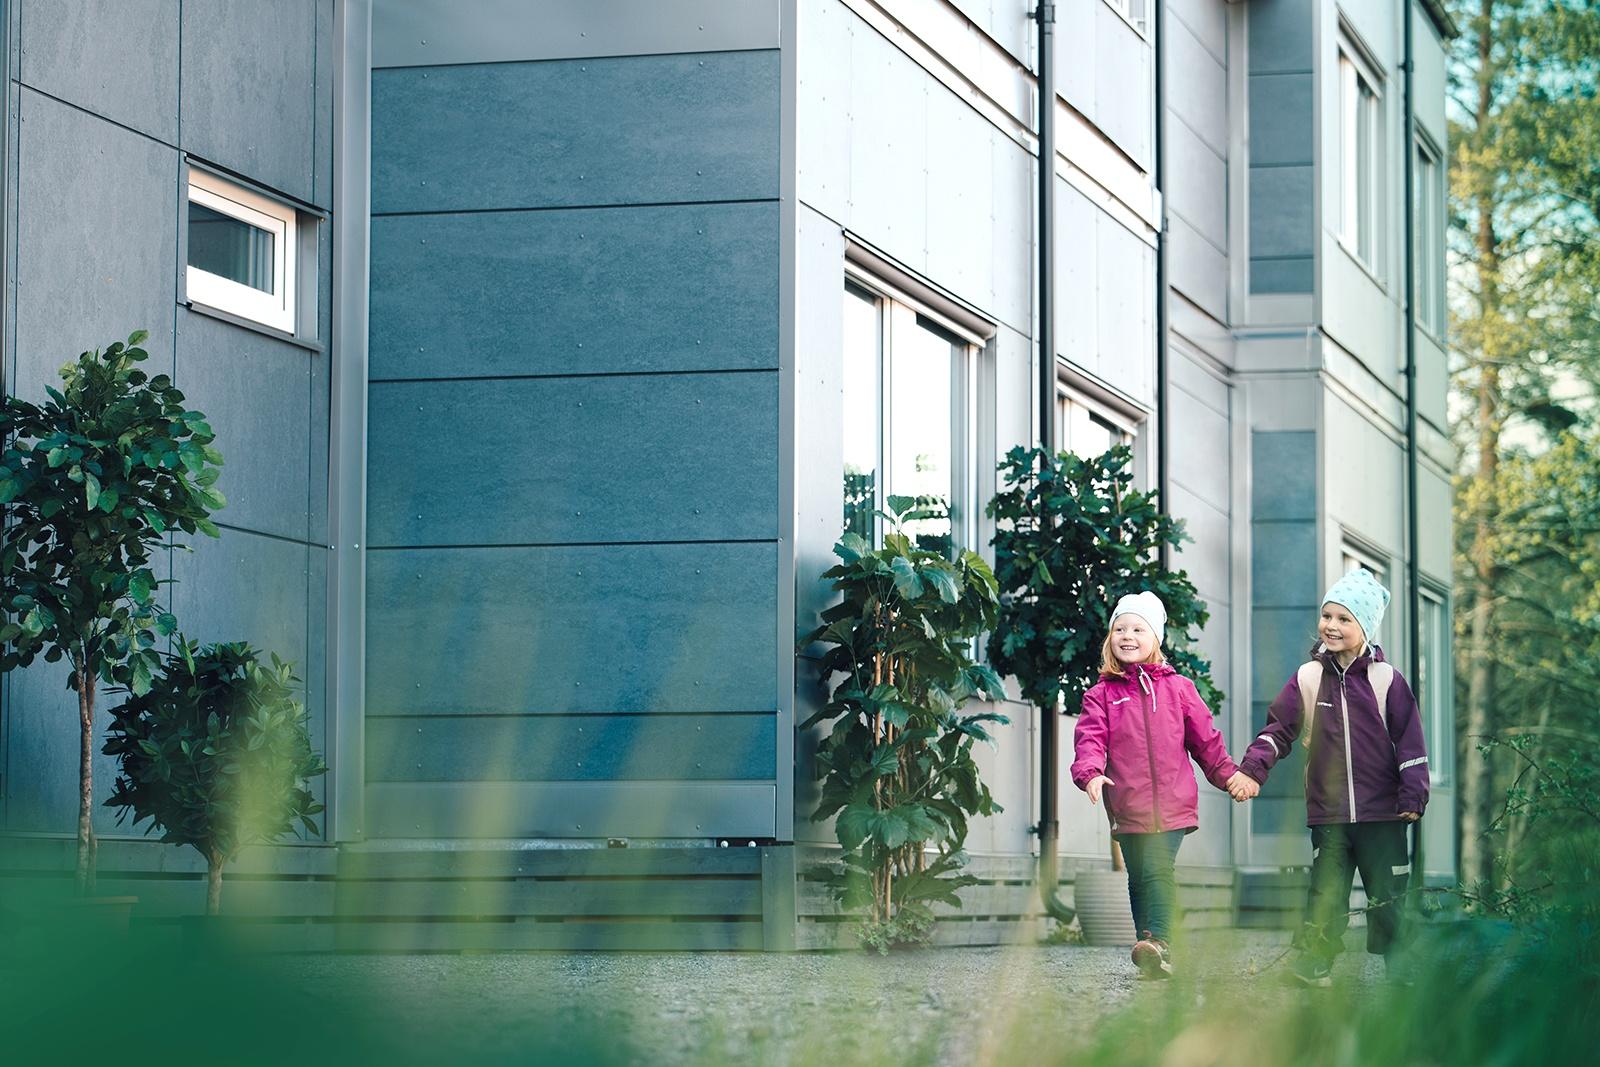 adapteo-daycare-gustavsberg-2020-SS9_4957-Edit_1600